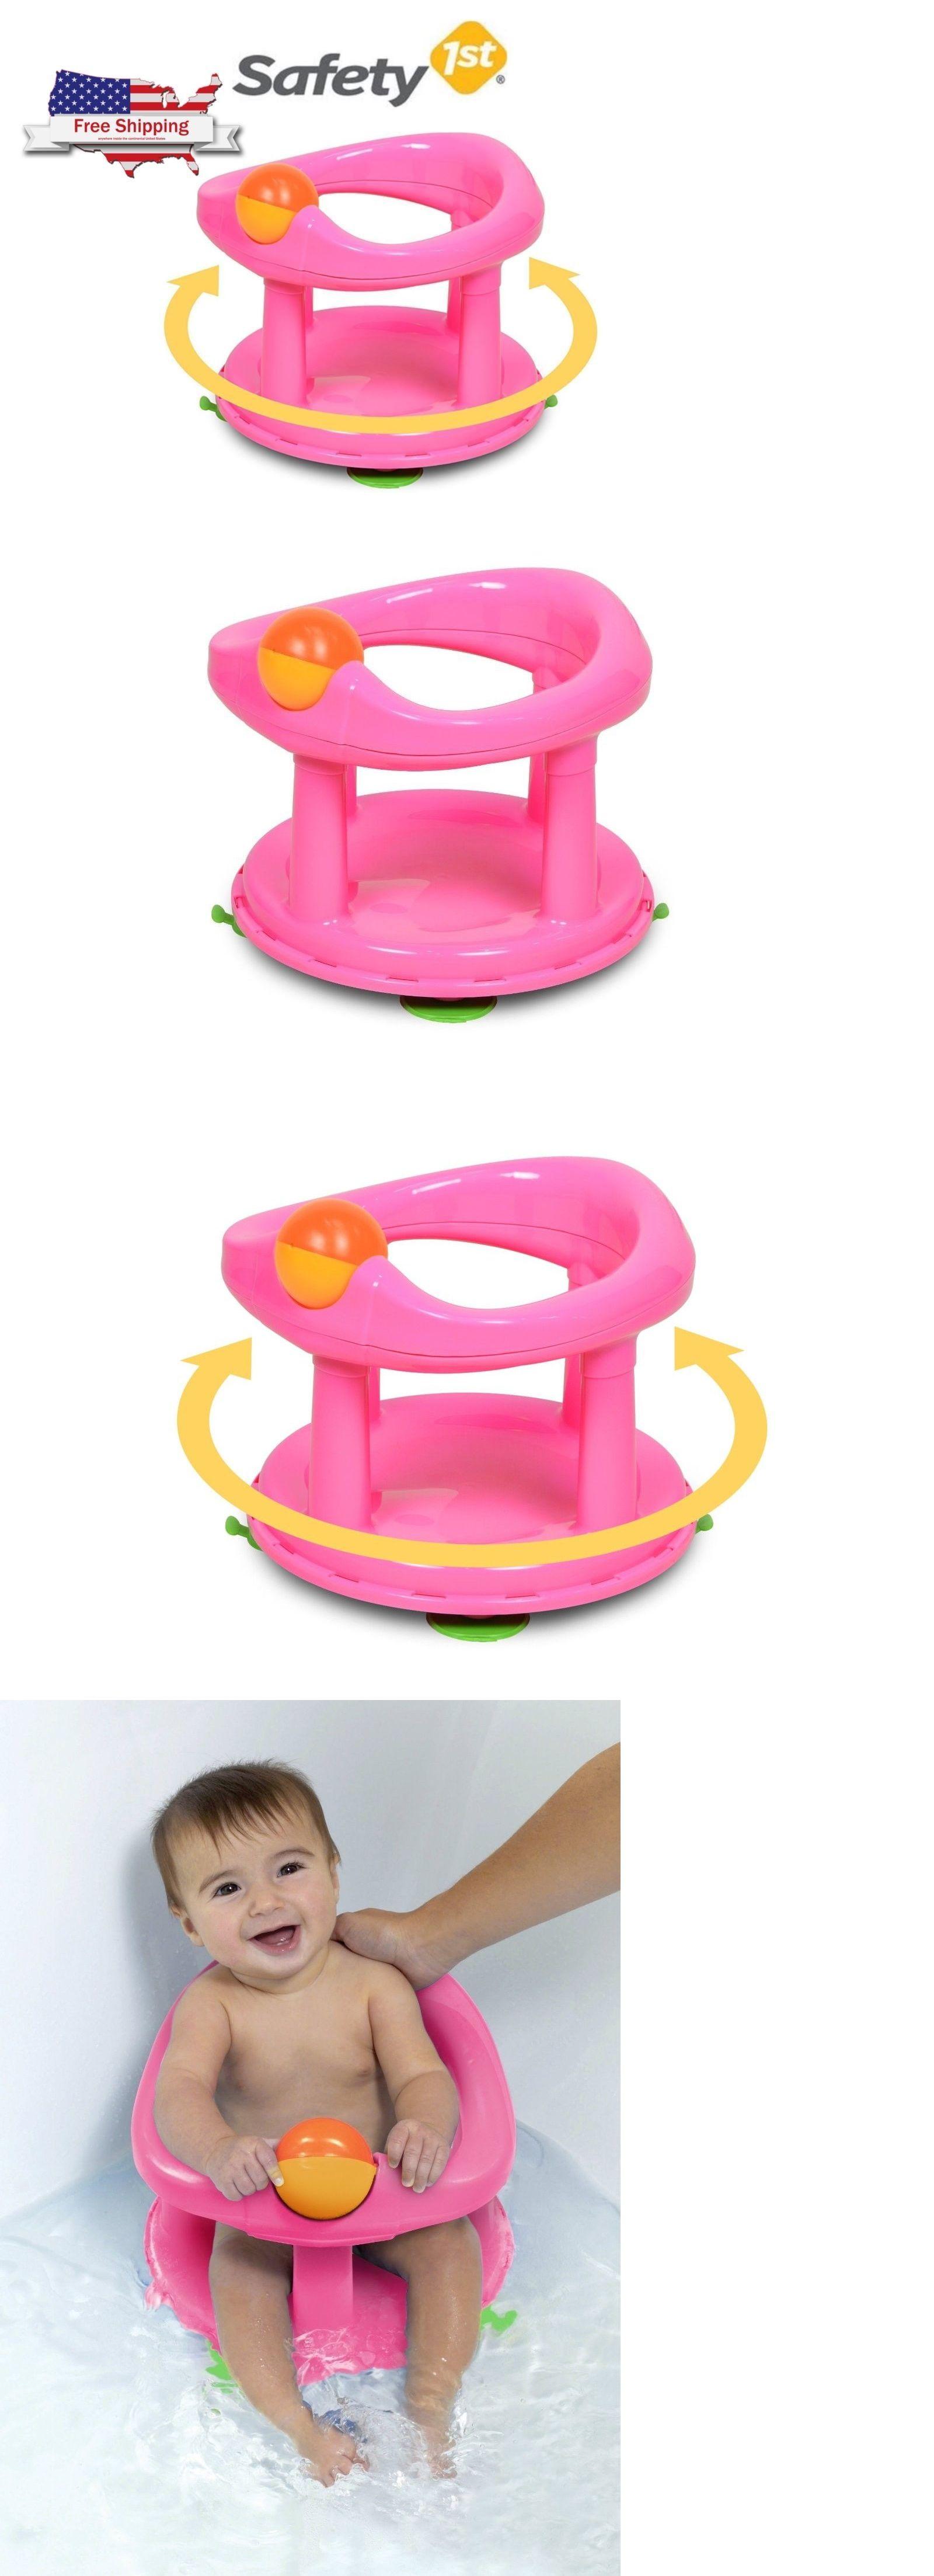 Bath Tub Seats and Rings 162024: Baby Infant Bath Tub Safety 1St ...